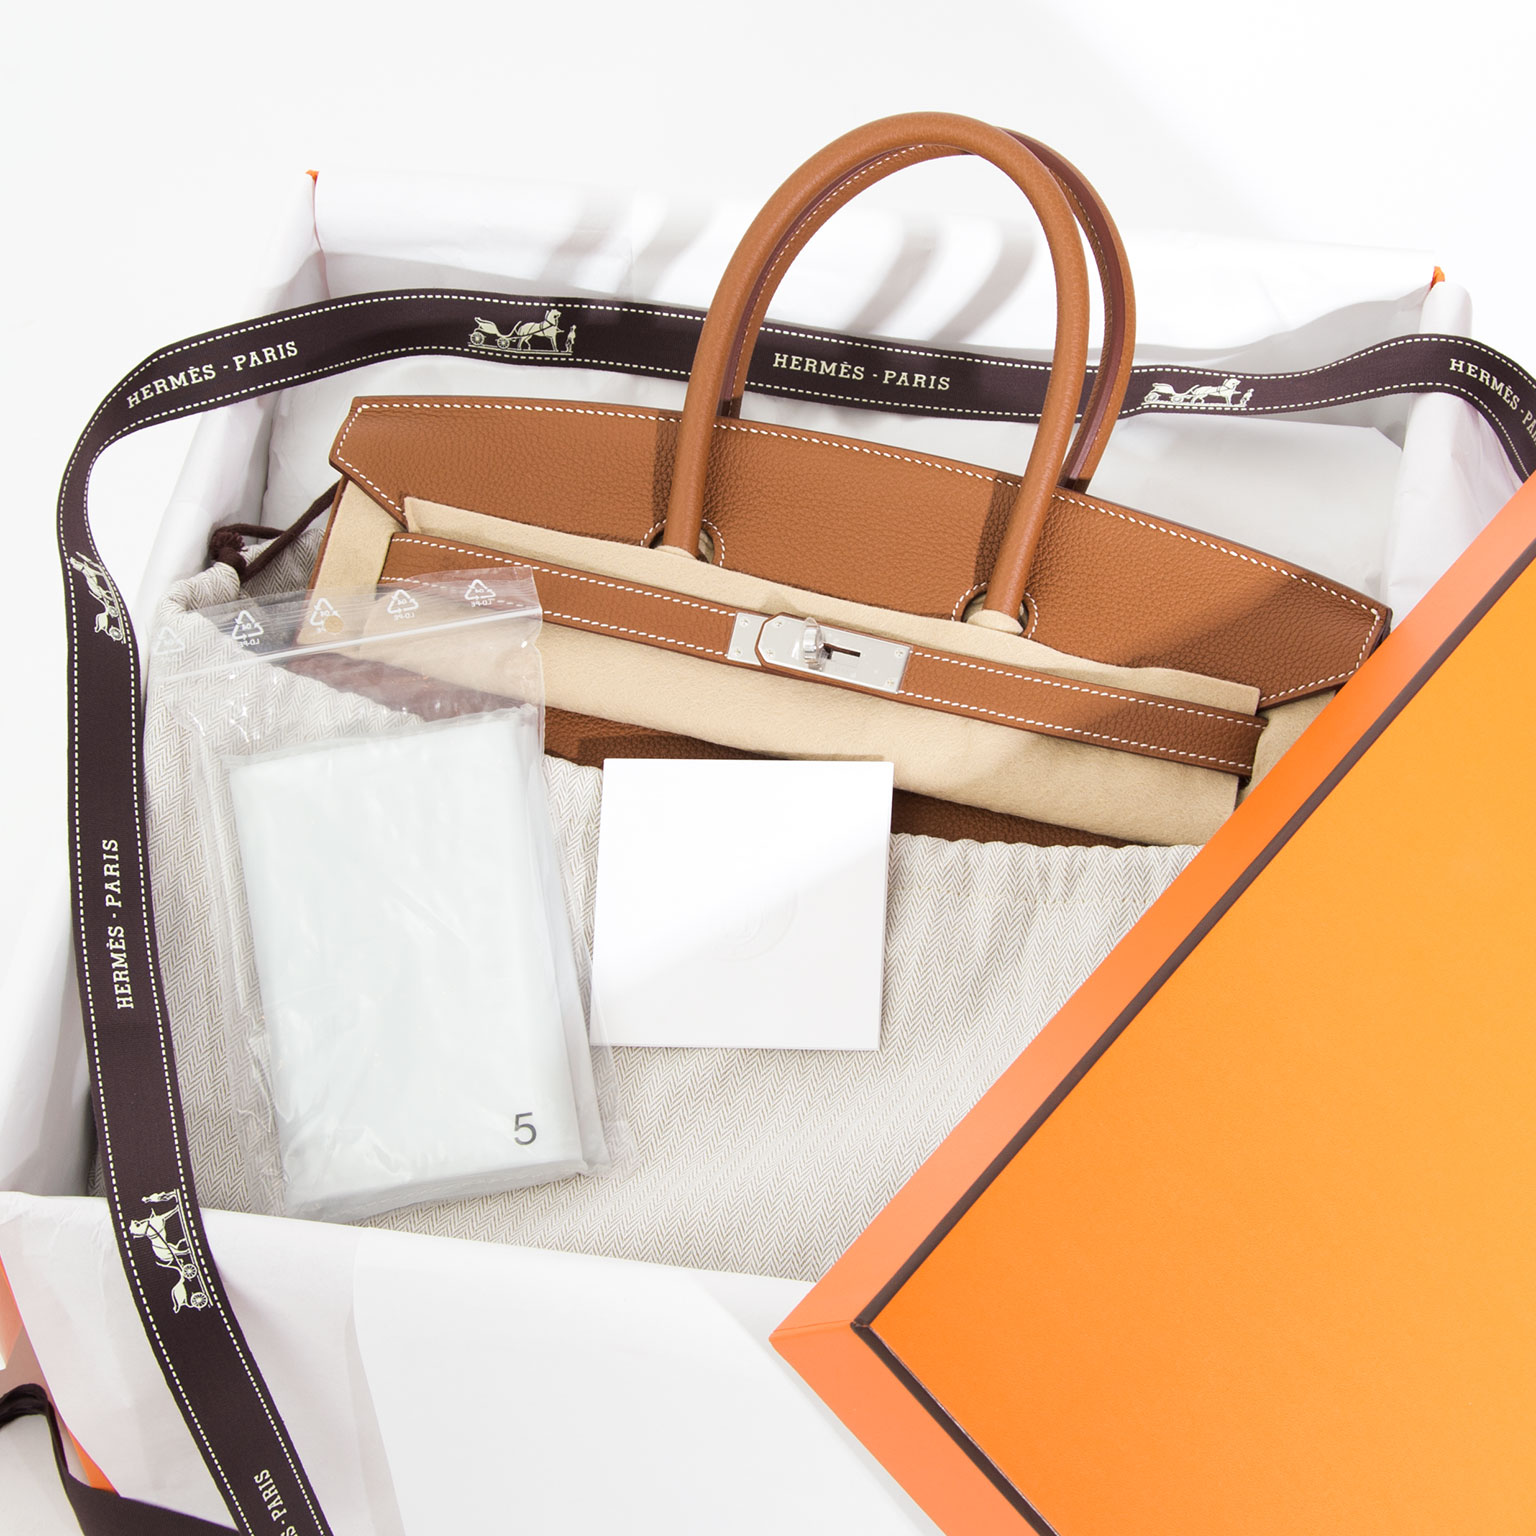 2c7be7040f2fd Koop veilig onine BRAND NEW Hermès Birkin Bag 35 PHW Togo Gold Worldwide  shipping. Koop veilig onine tweedehands